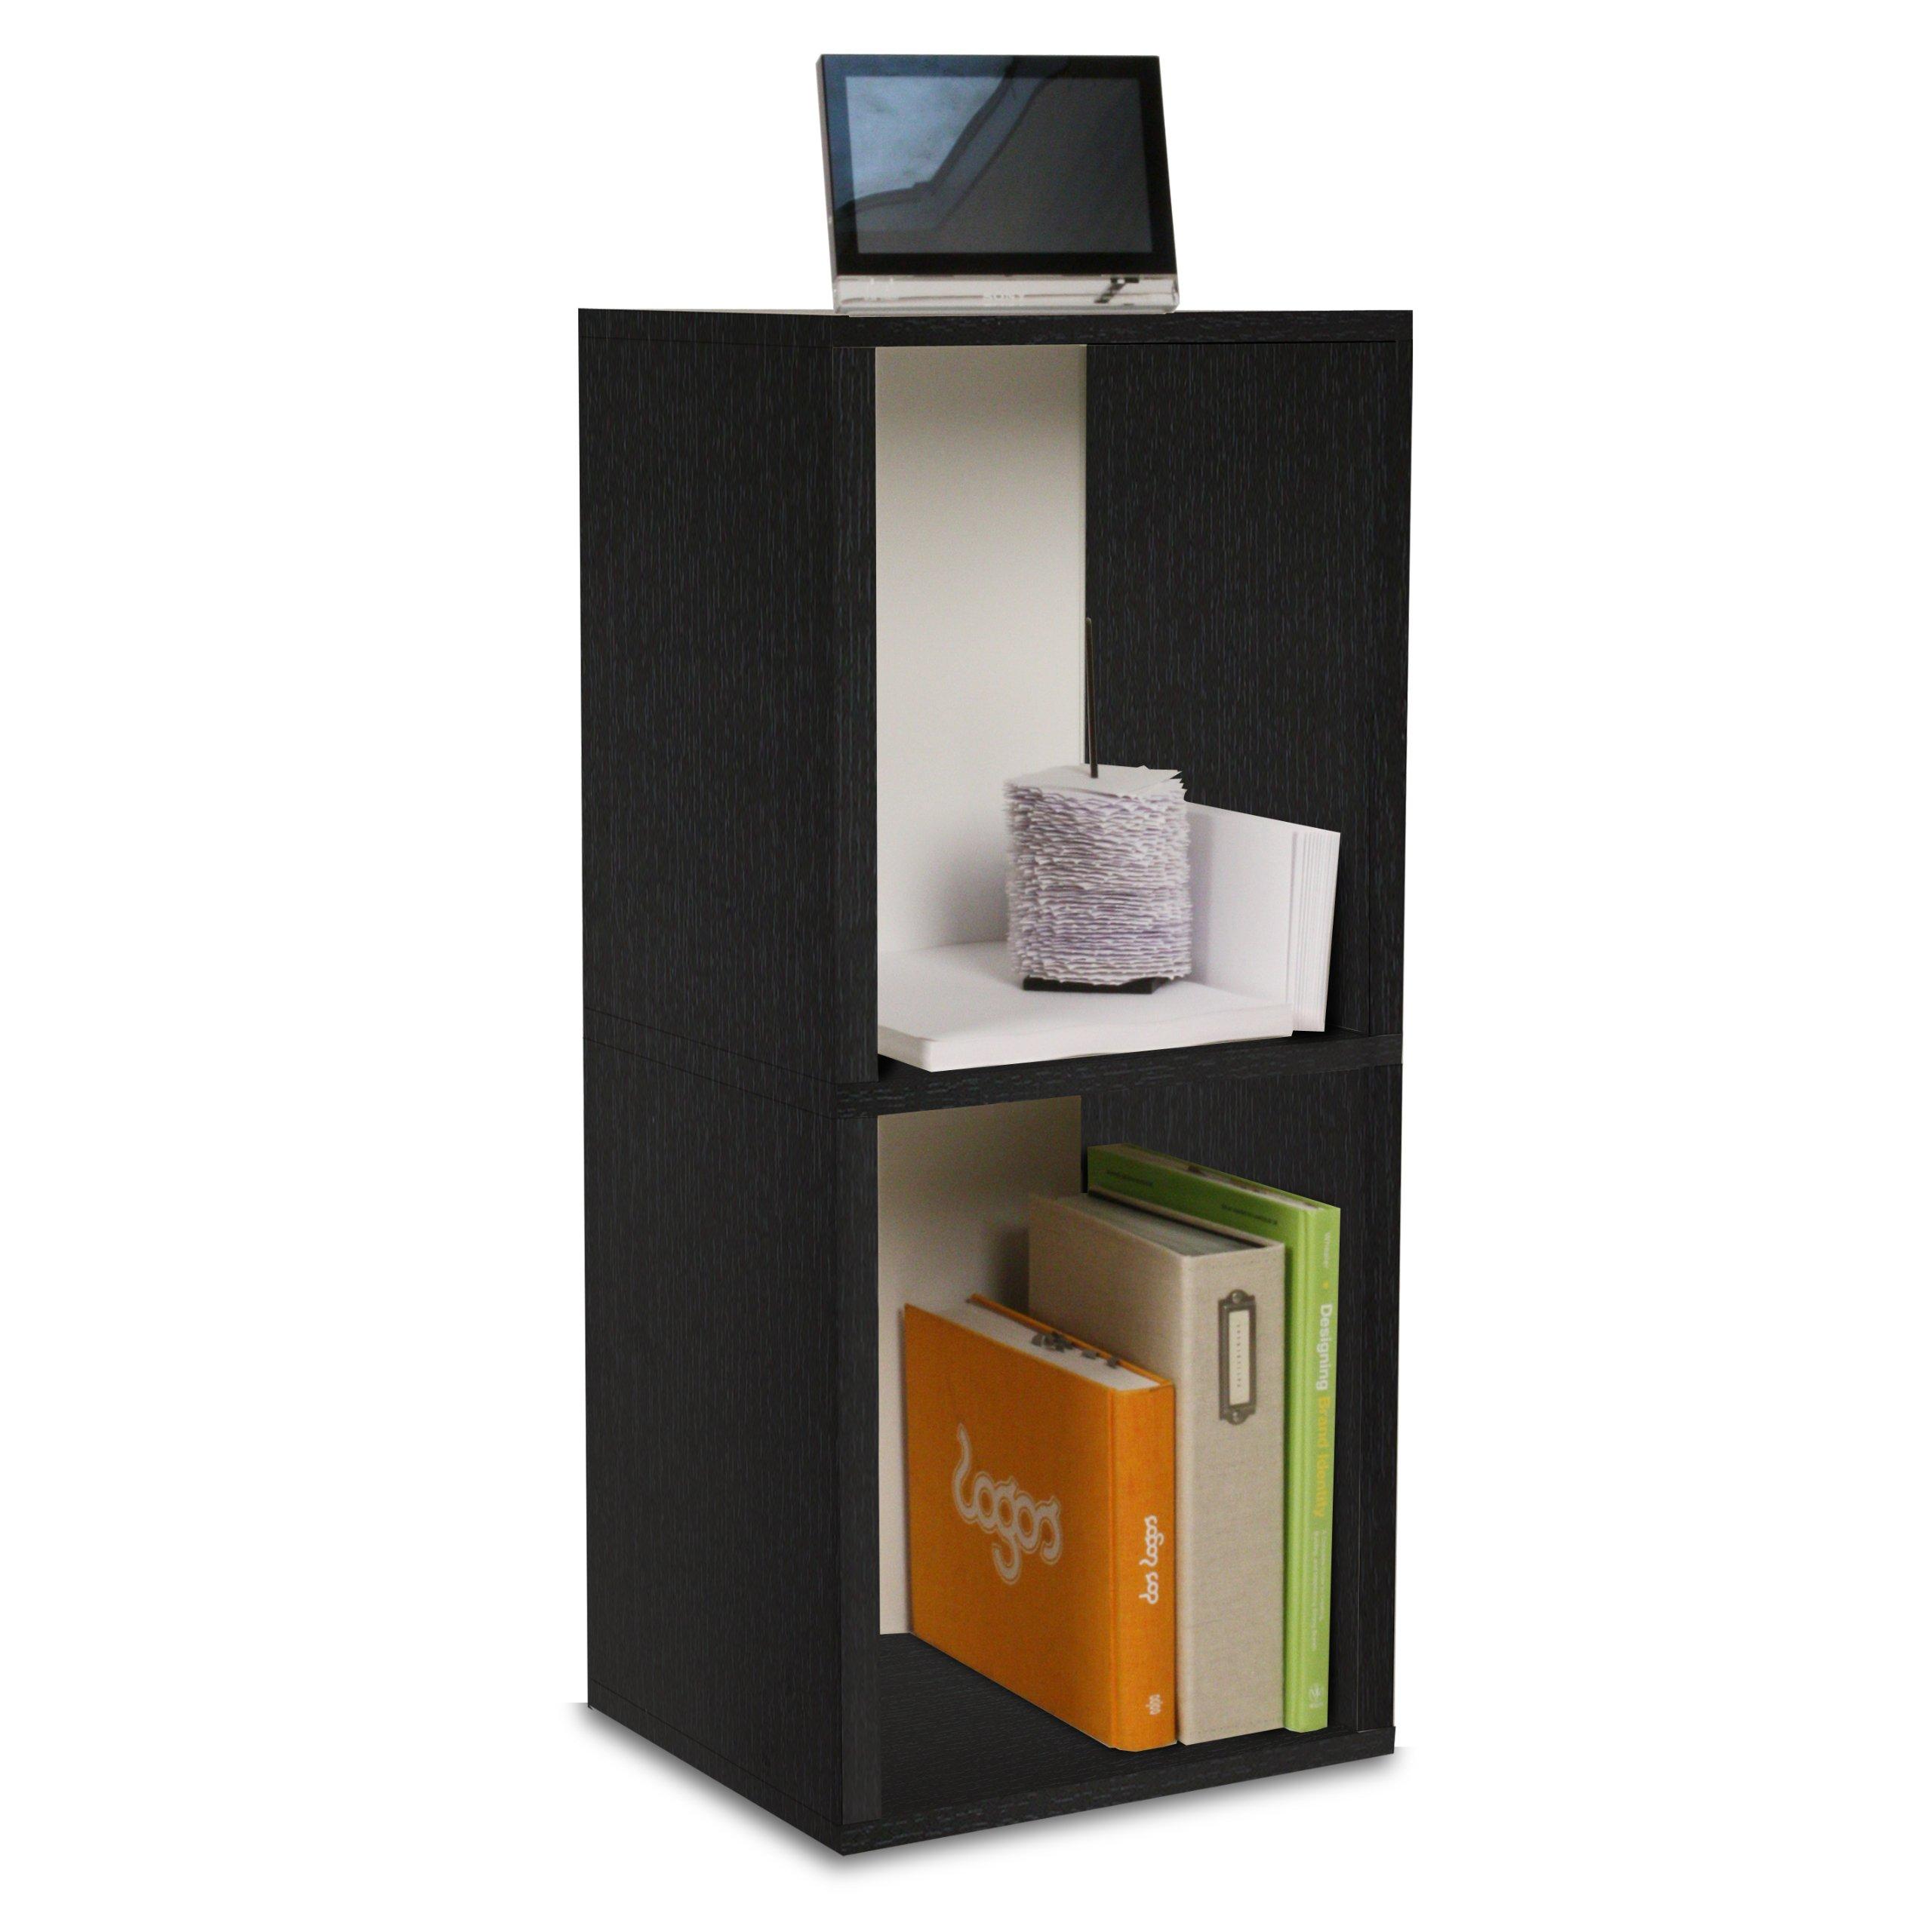 Way Basics ZBoard Eco Storage Cube Plus 2 Shelf Storage Unit, Black Wood  Grain